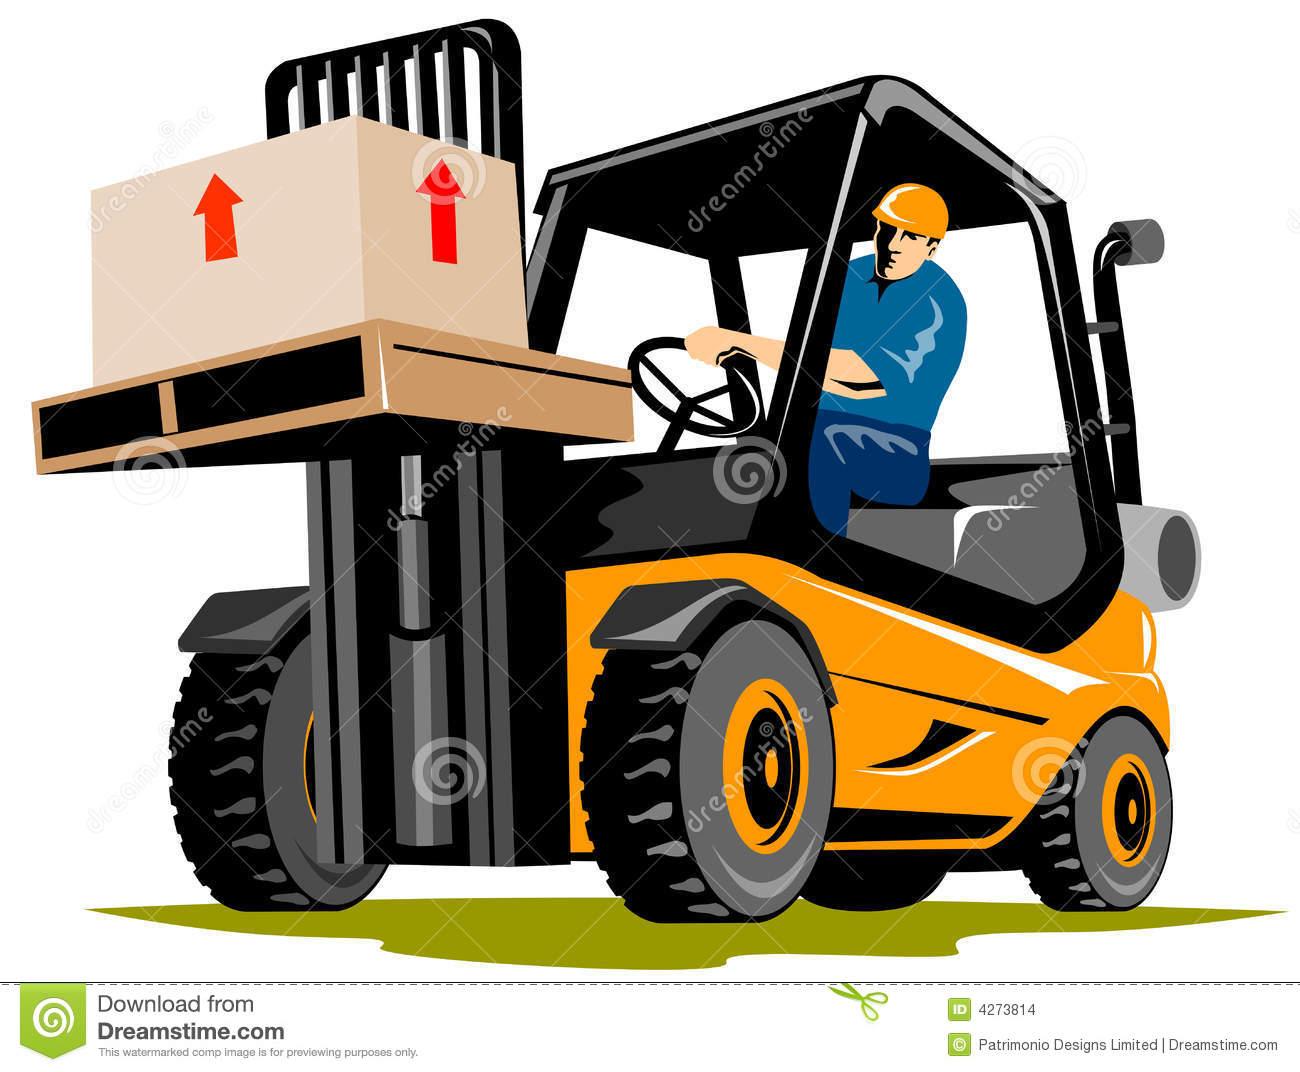 Forklift truck clipart.